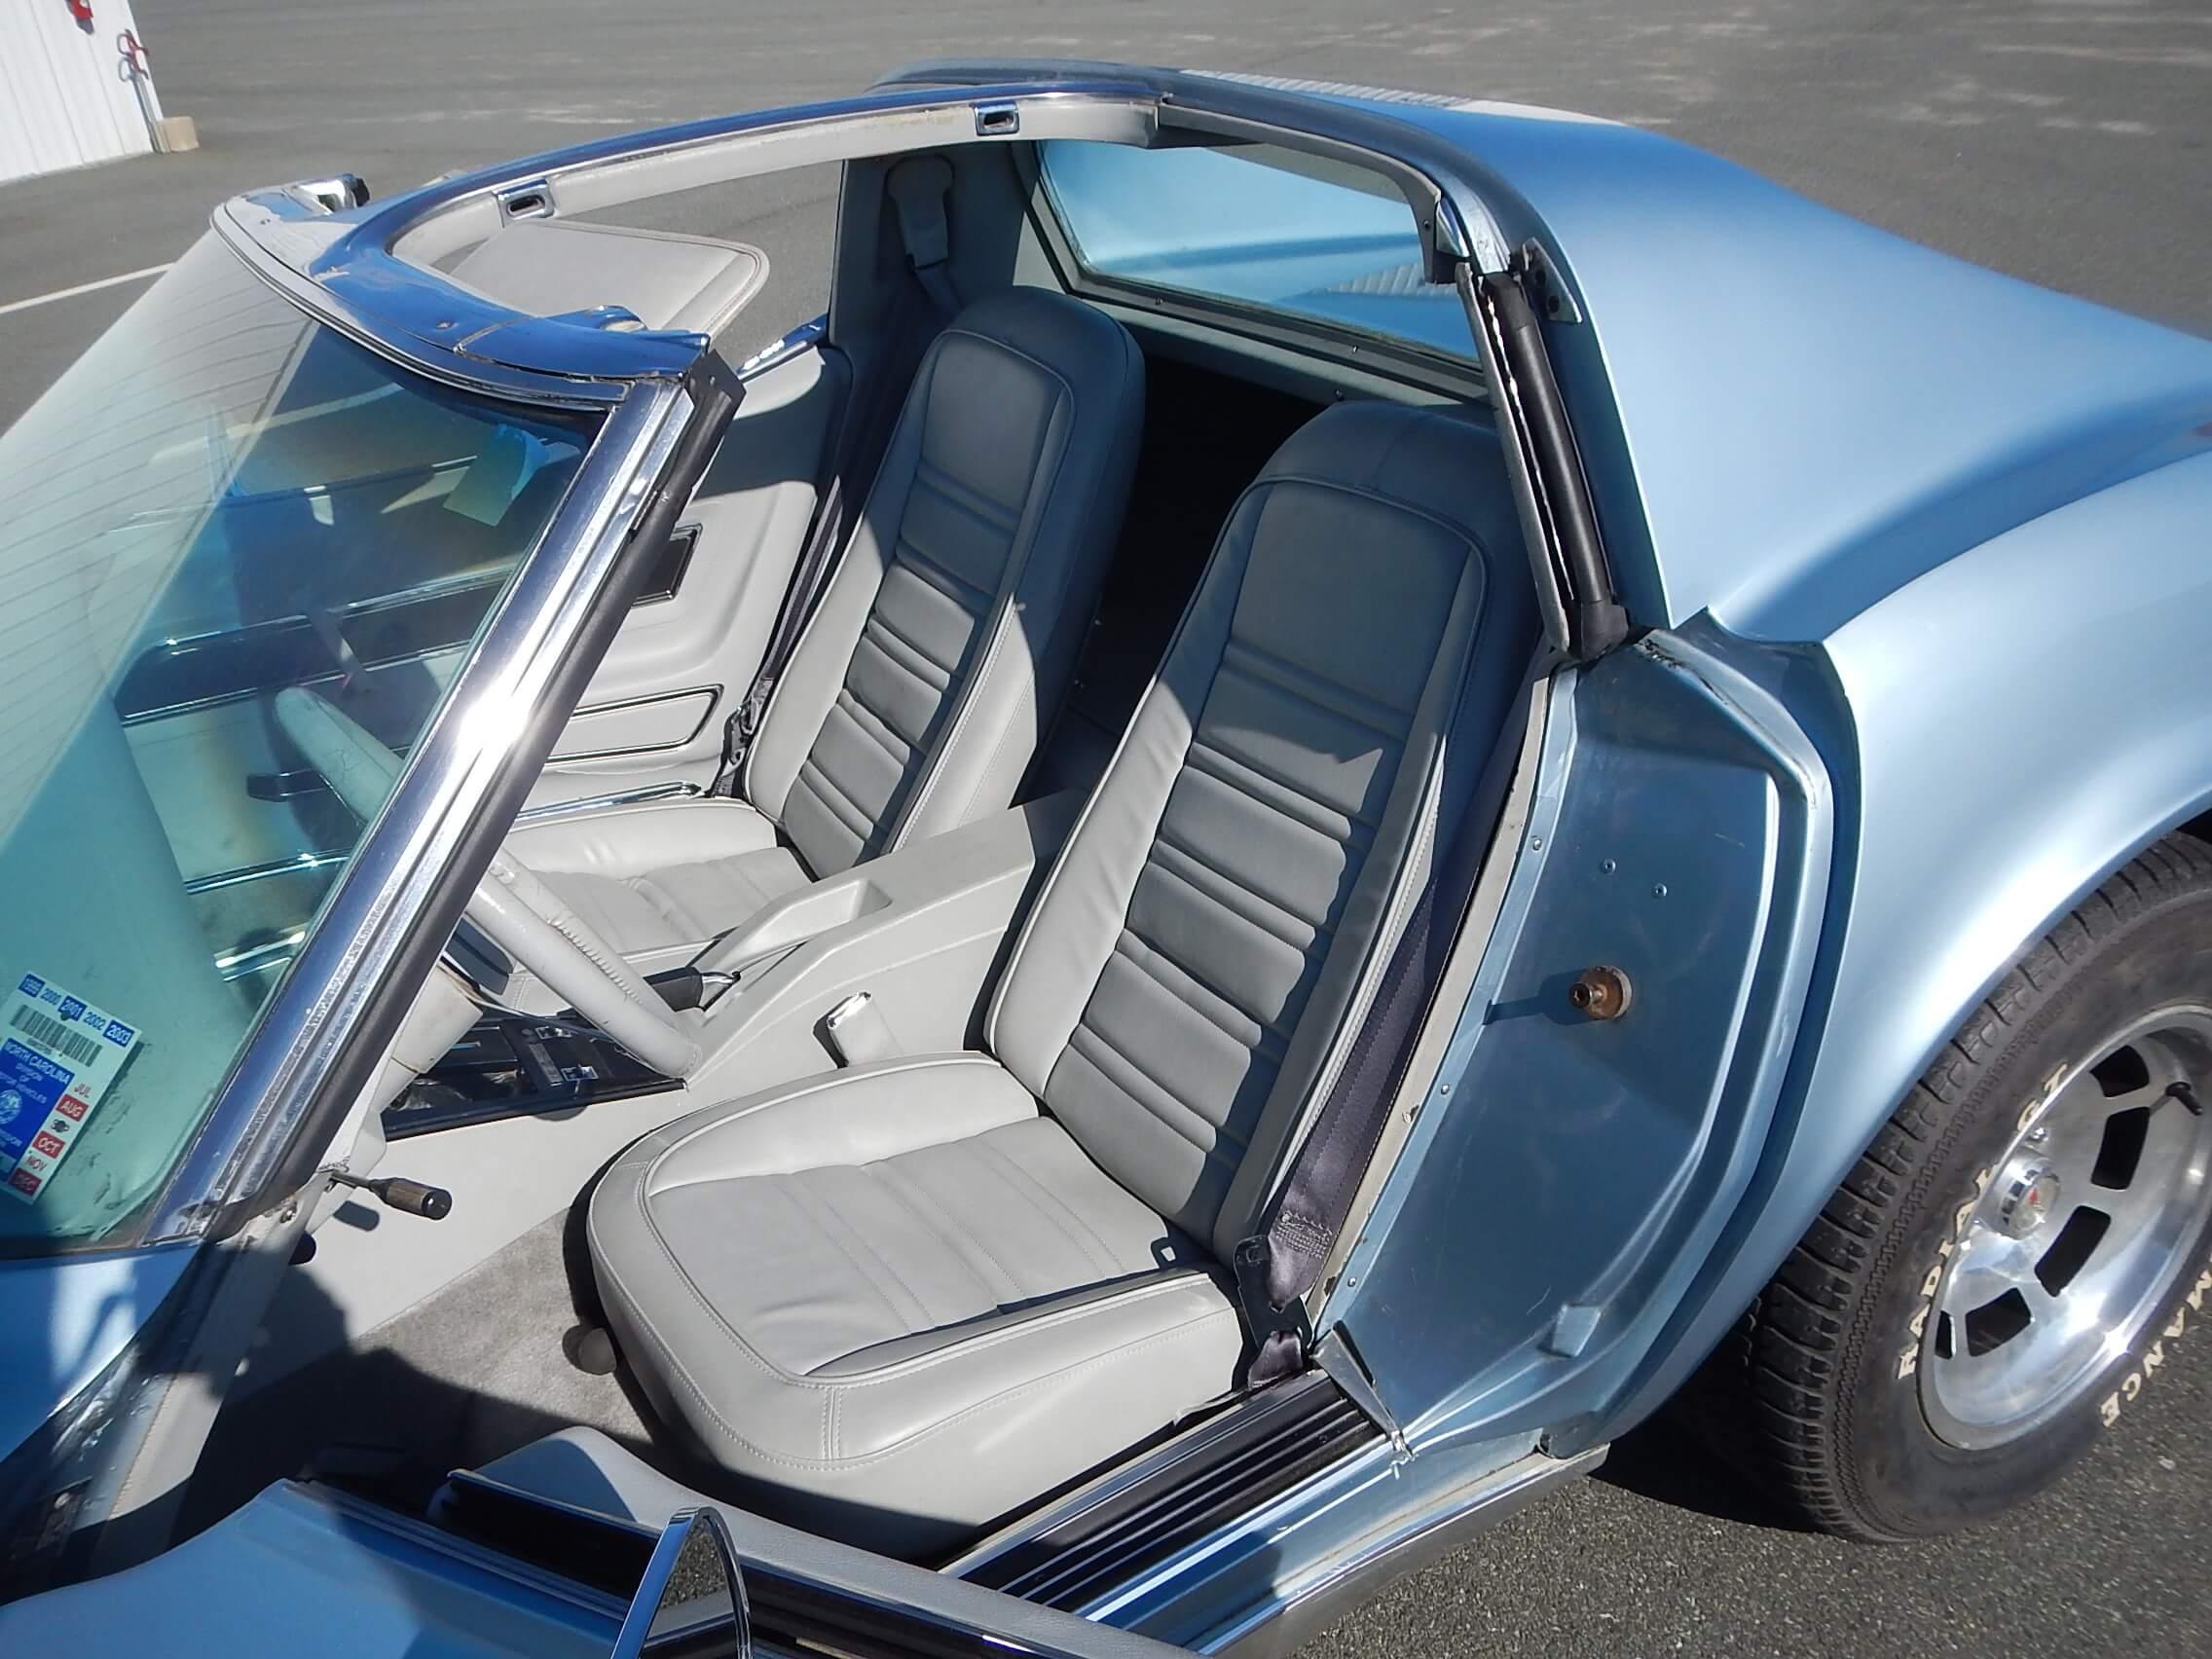 1977 Corvette Coupe restoration 66.JPG